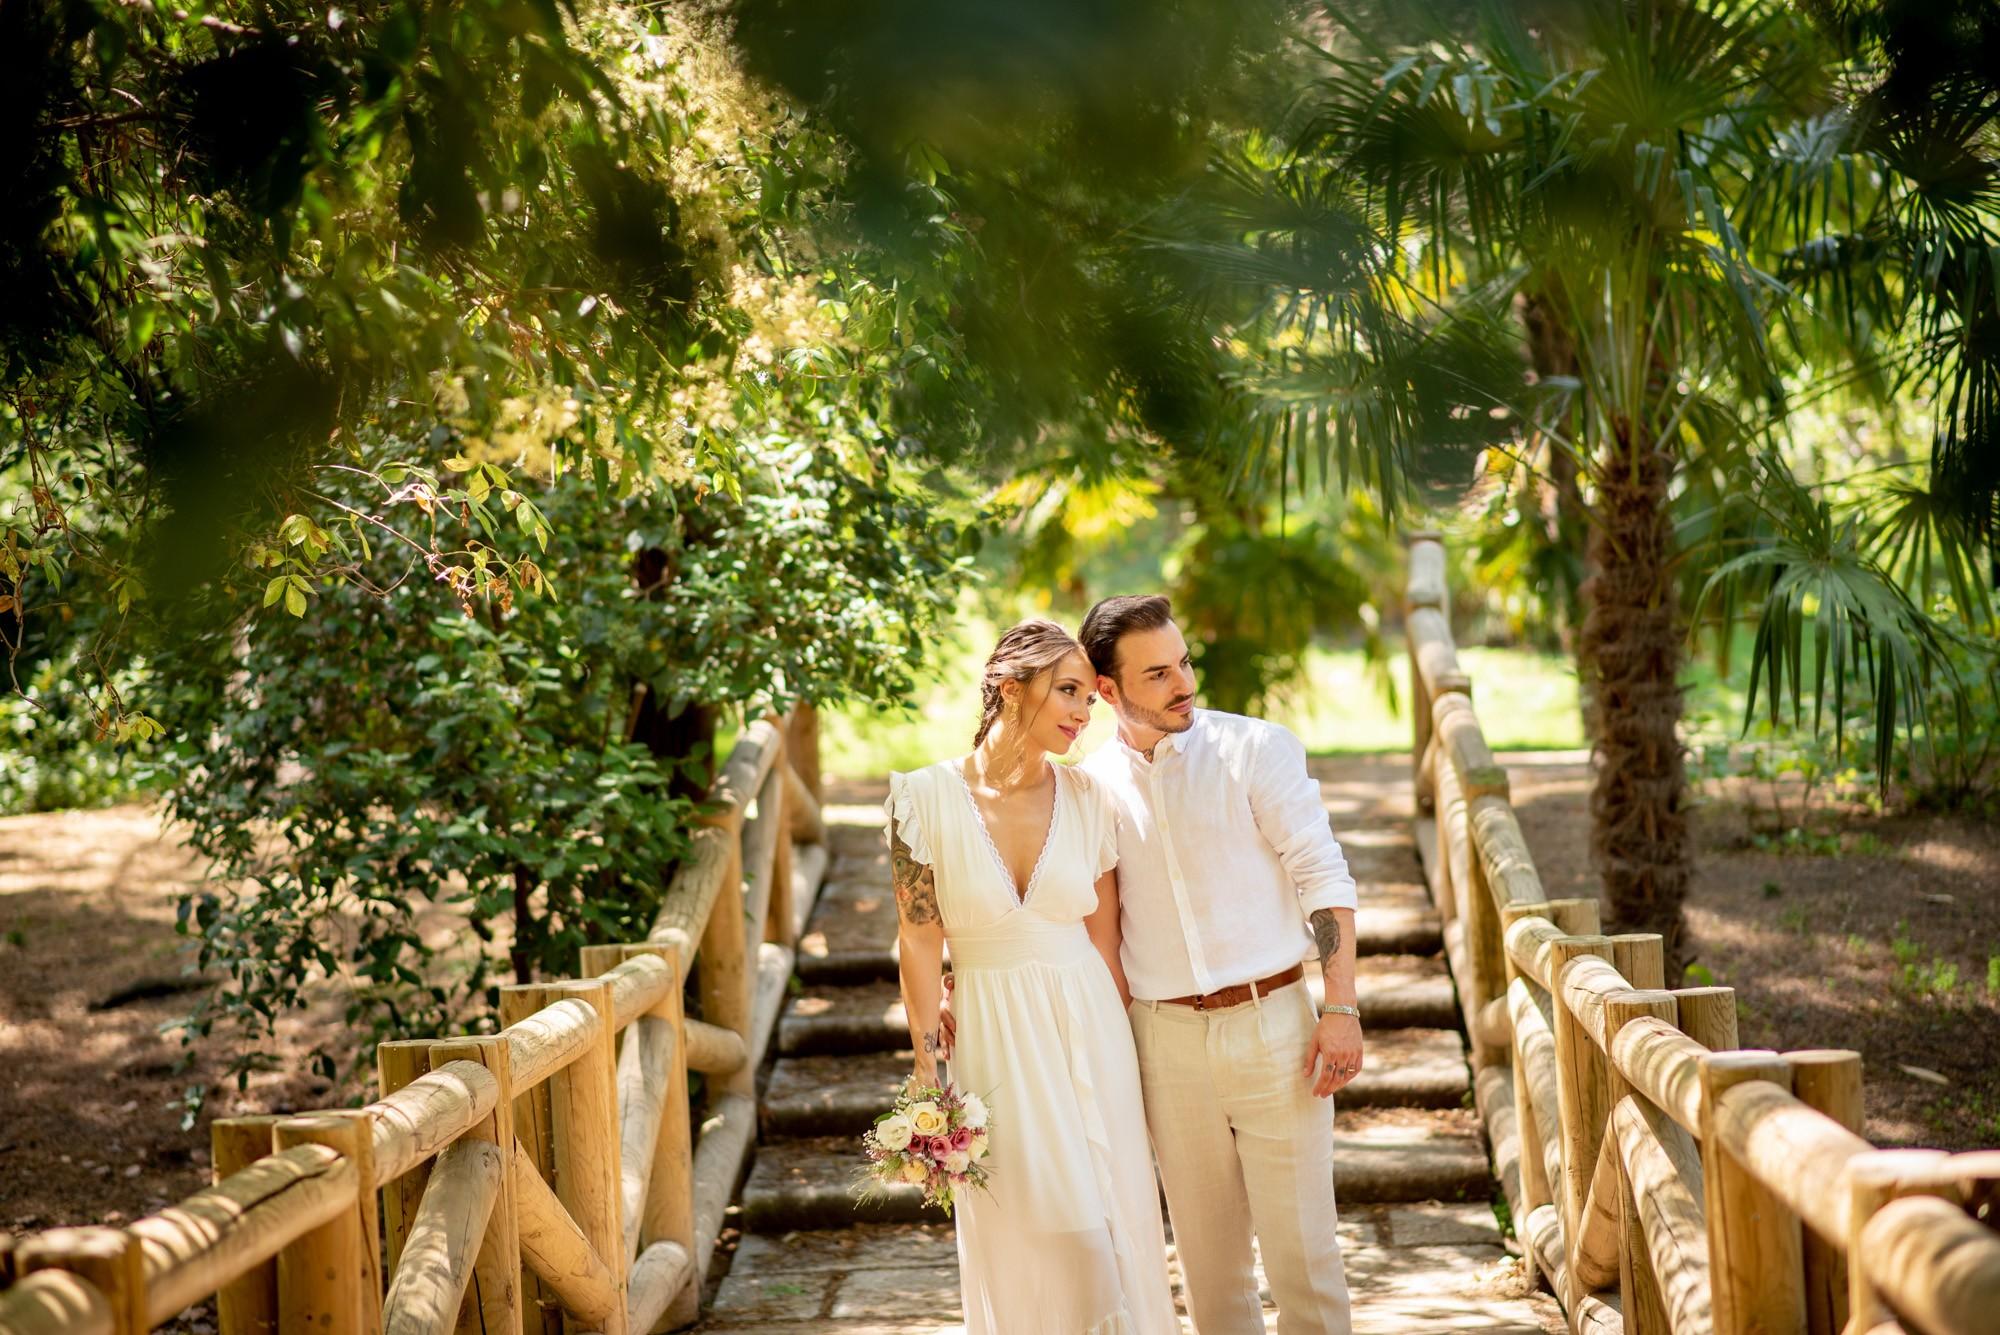 fotografos-boda-madrid-514919